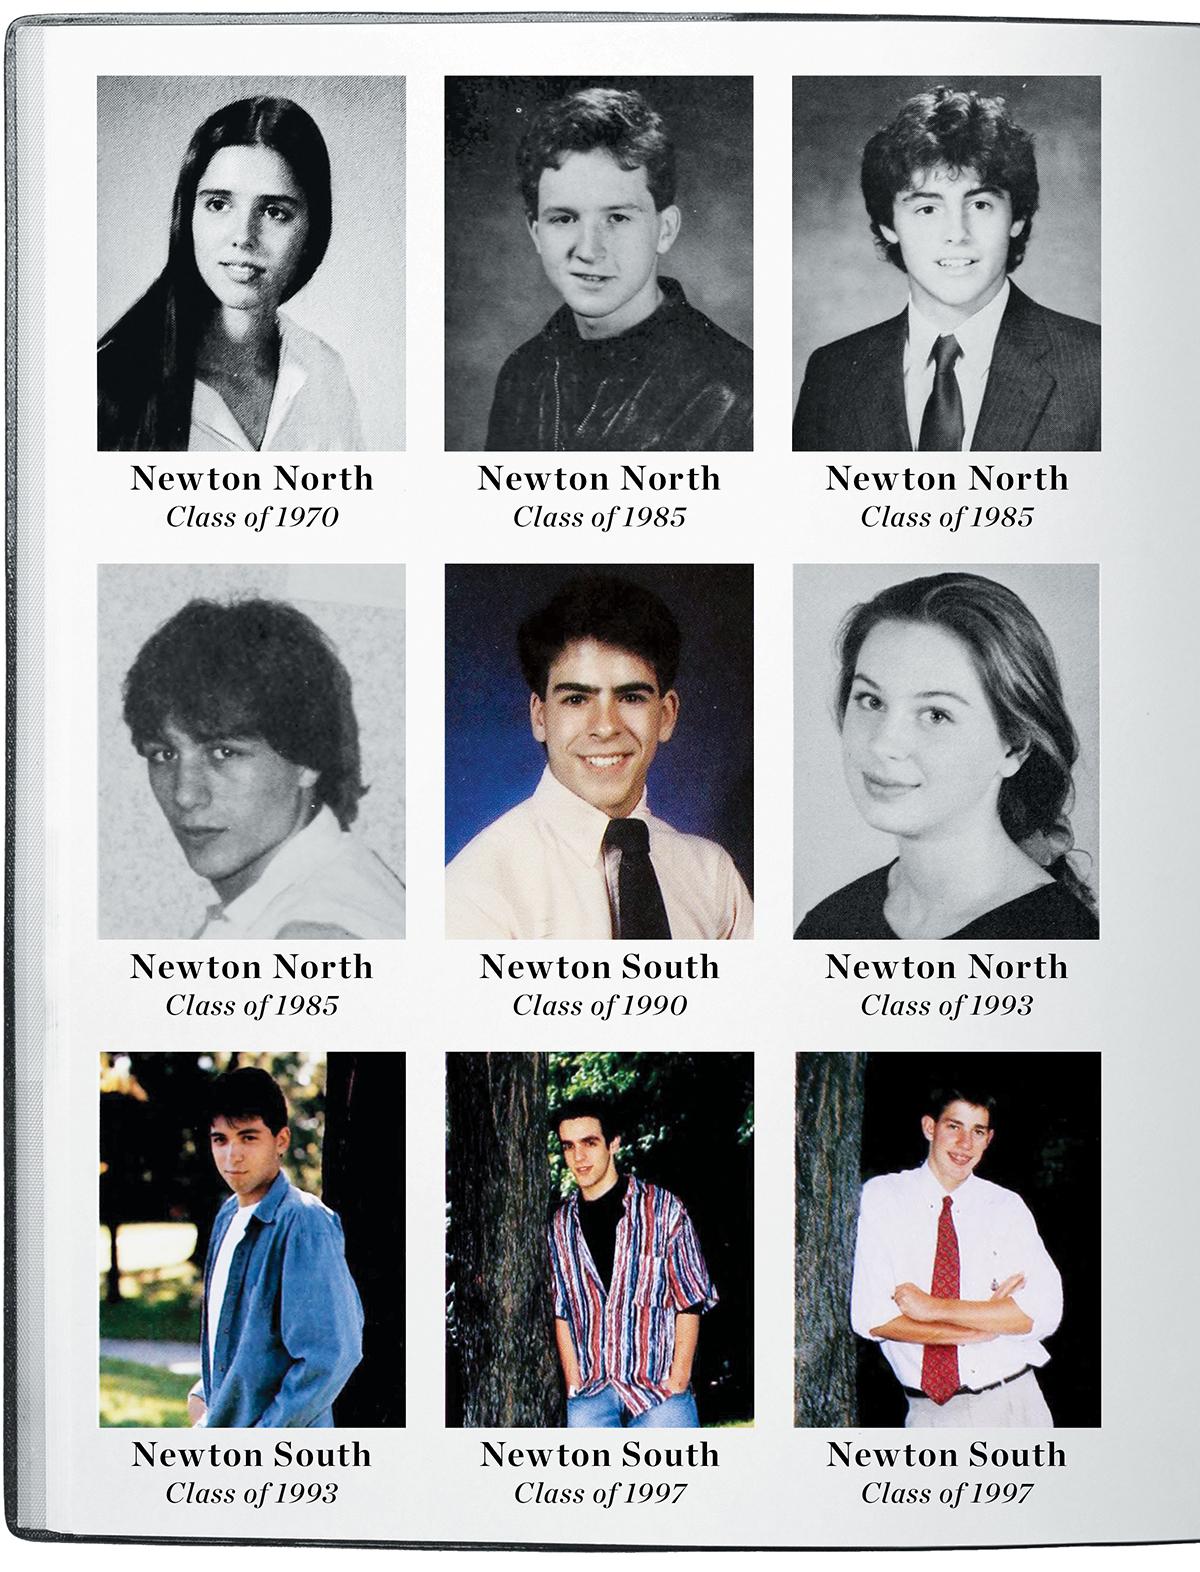 U.S., School Yearbooks, 1900-1990 - Ancestry.com